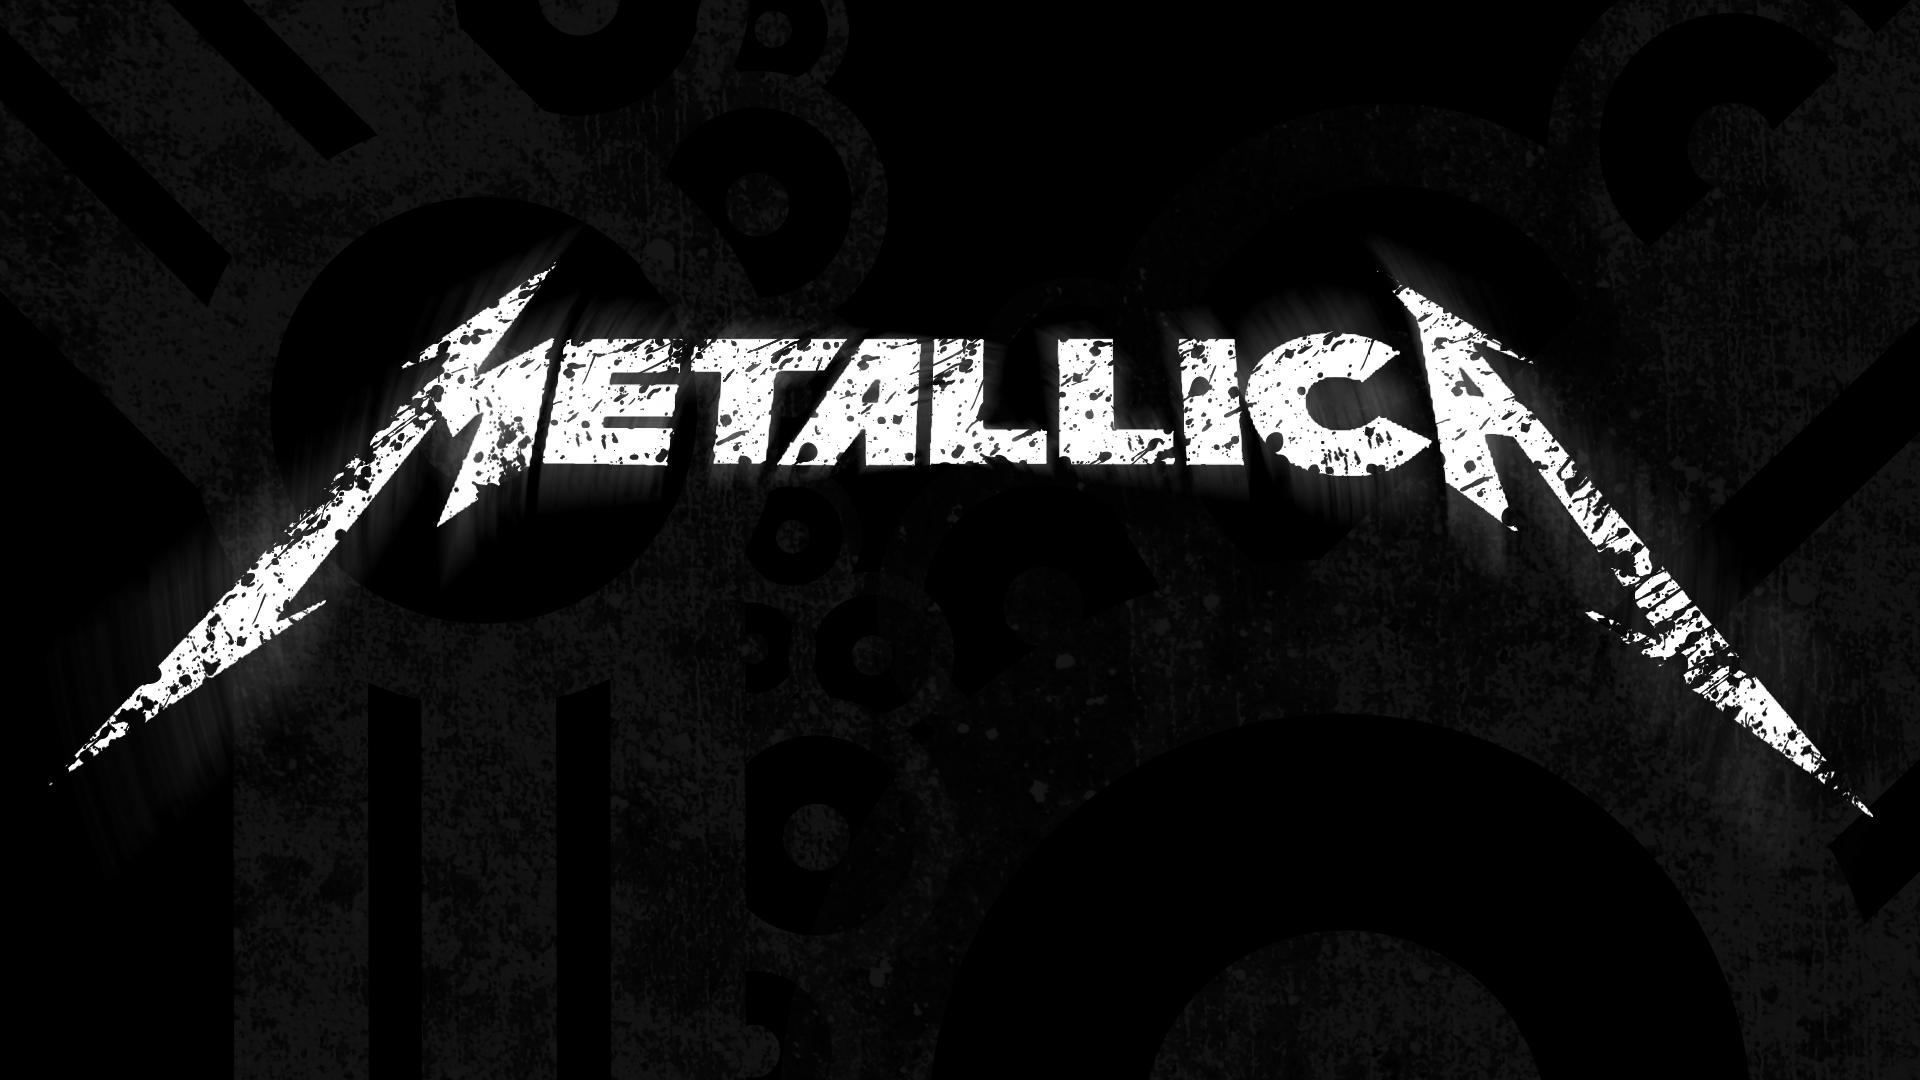 Wallpaper night text logo graphic design sign brand metallica midnight light - Metallica wallpaper ...